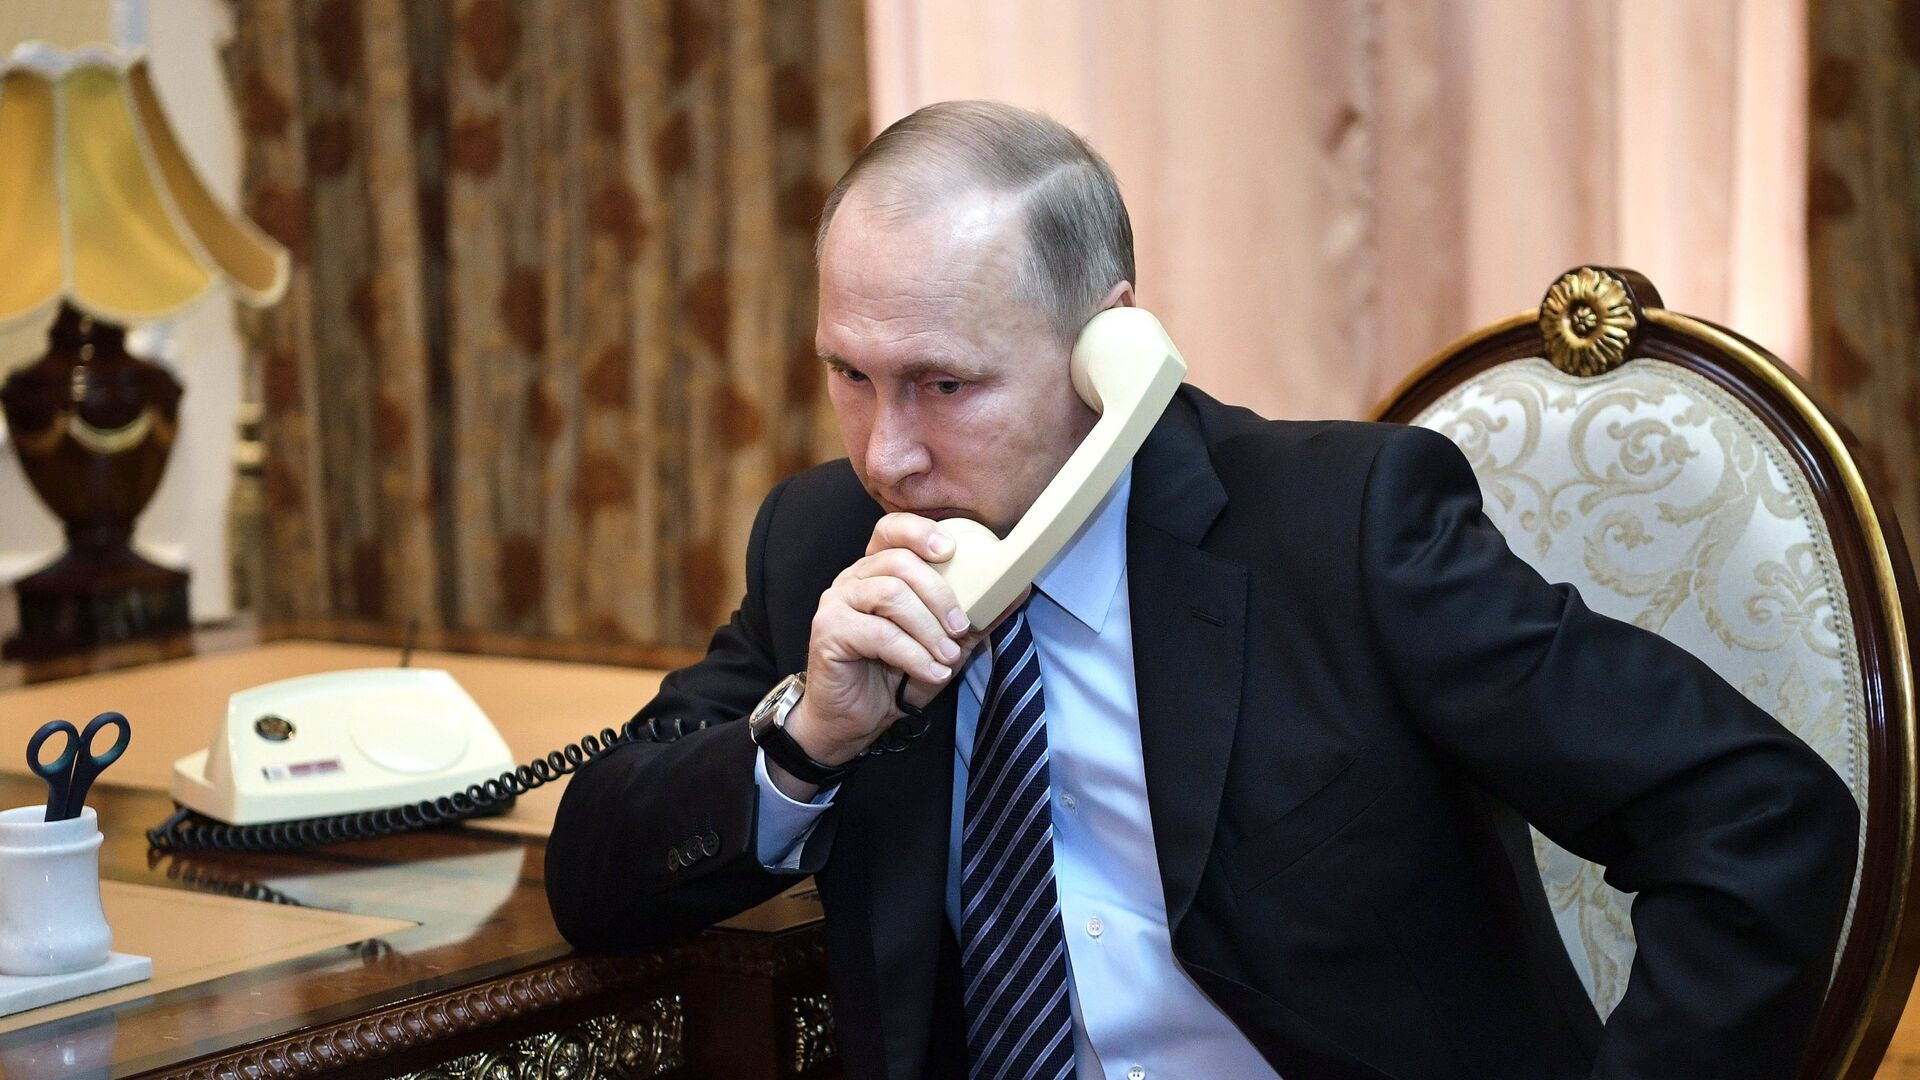 Vladímir Putin, presidente de Rusia - Sputnik Mundo, 1920, 26.04.2021